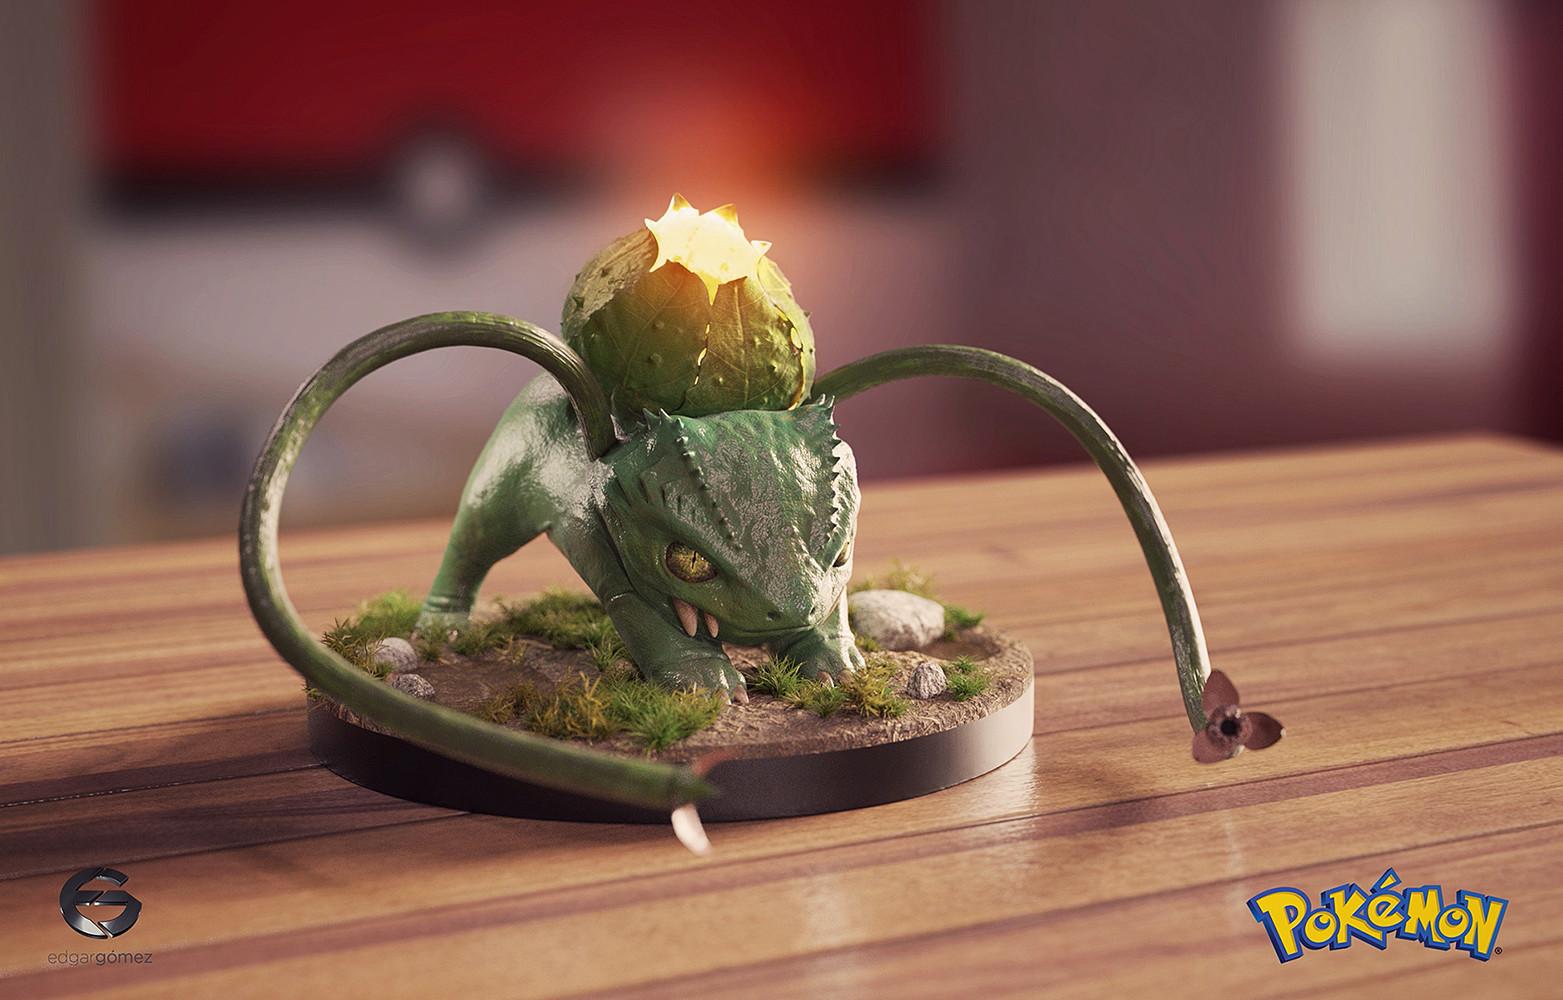 Edgar gomez bulbasaurpresentacionfinal 01